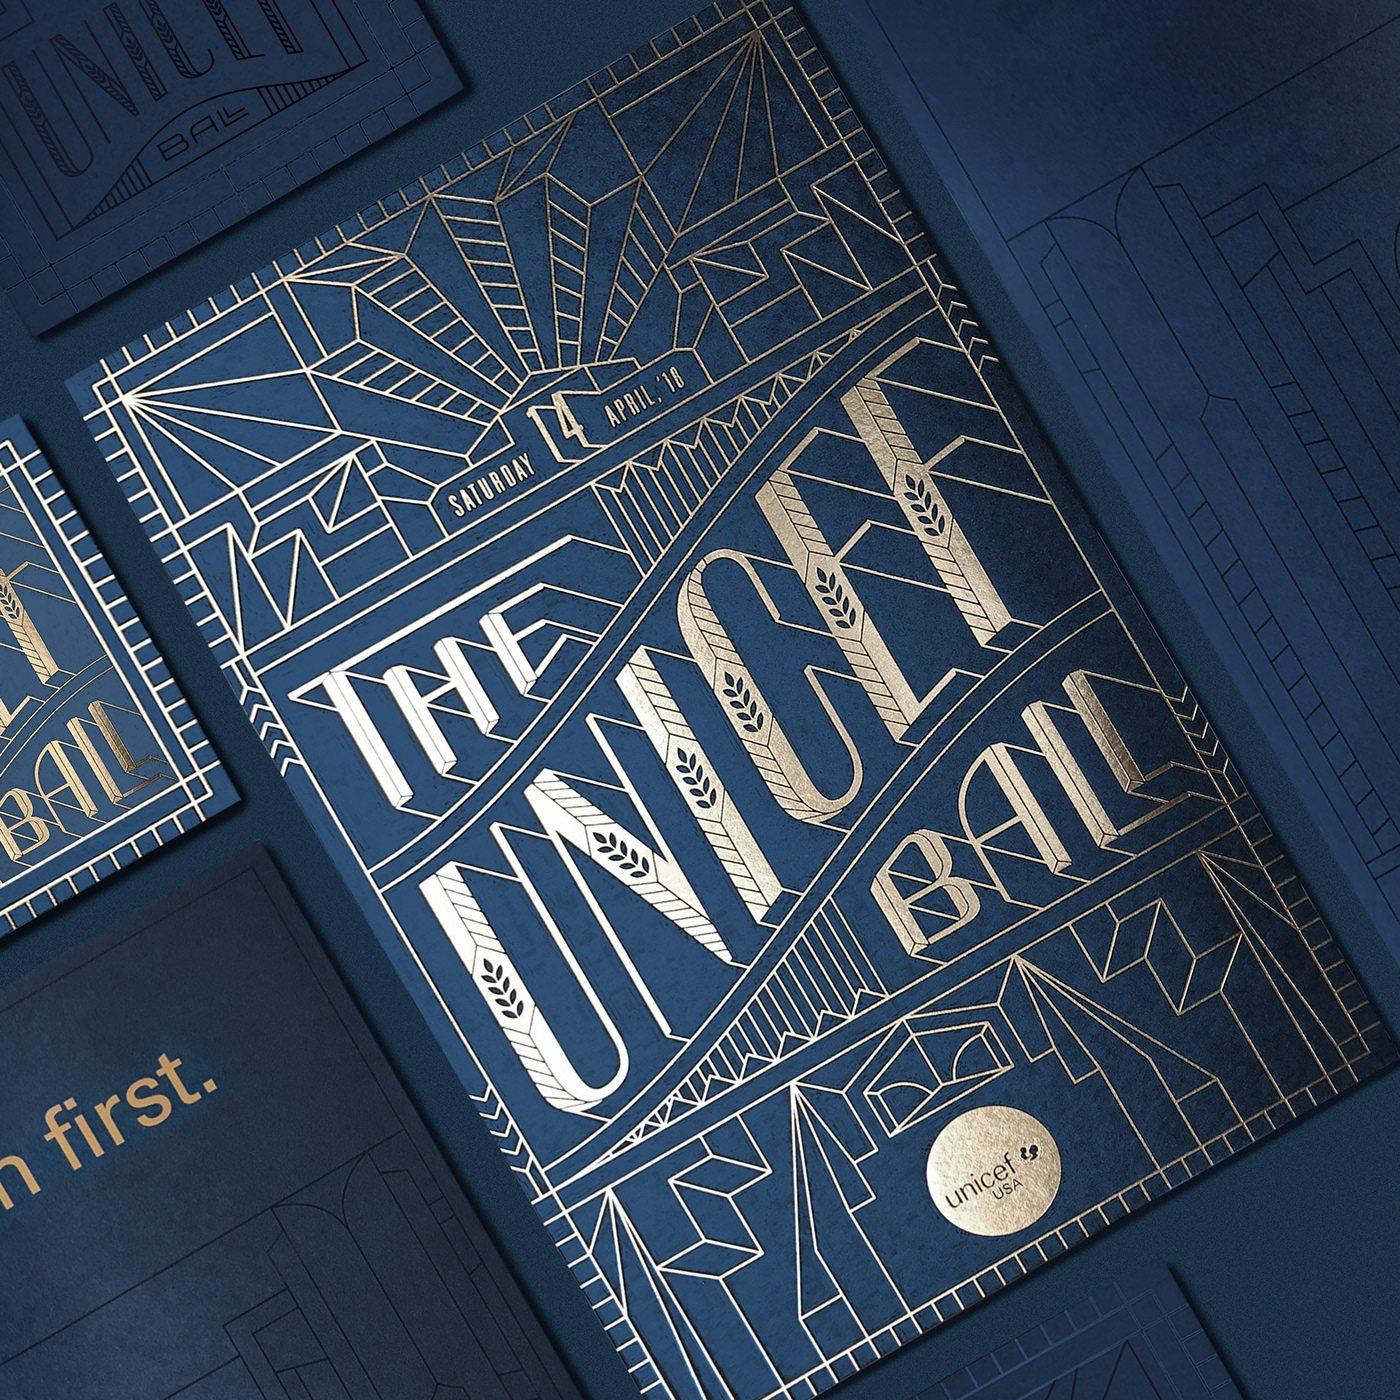 The Unicef Ball 2018 Identity